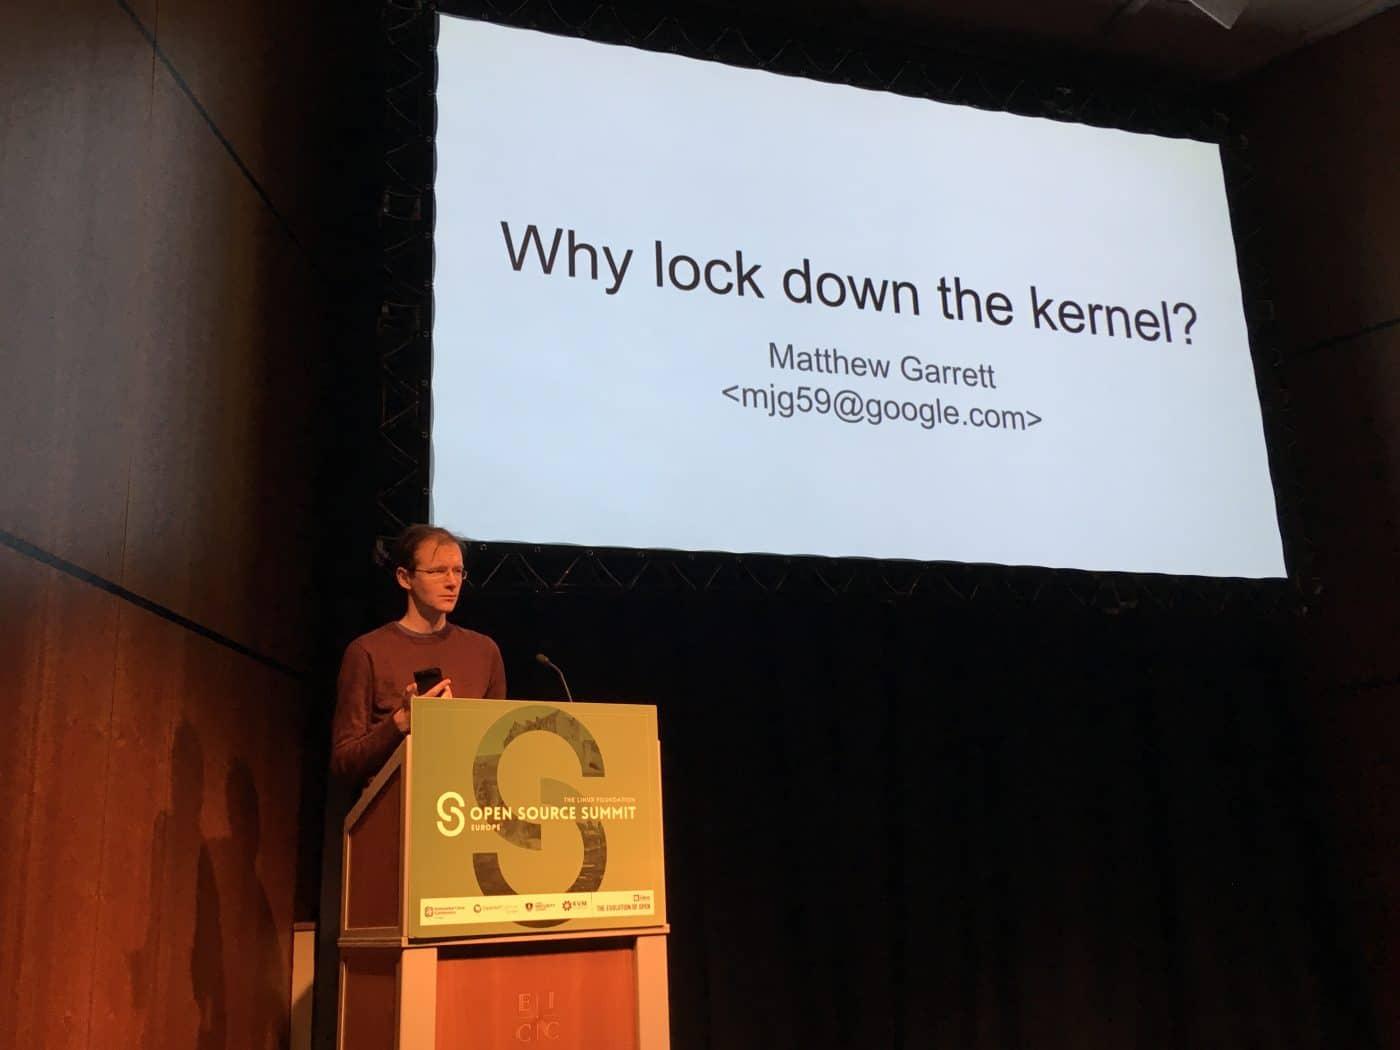 Matthew Garret waiting to start his talk